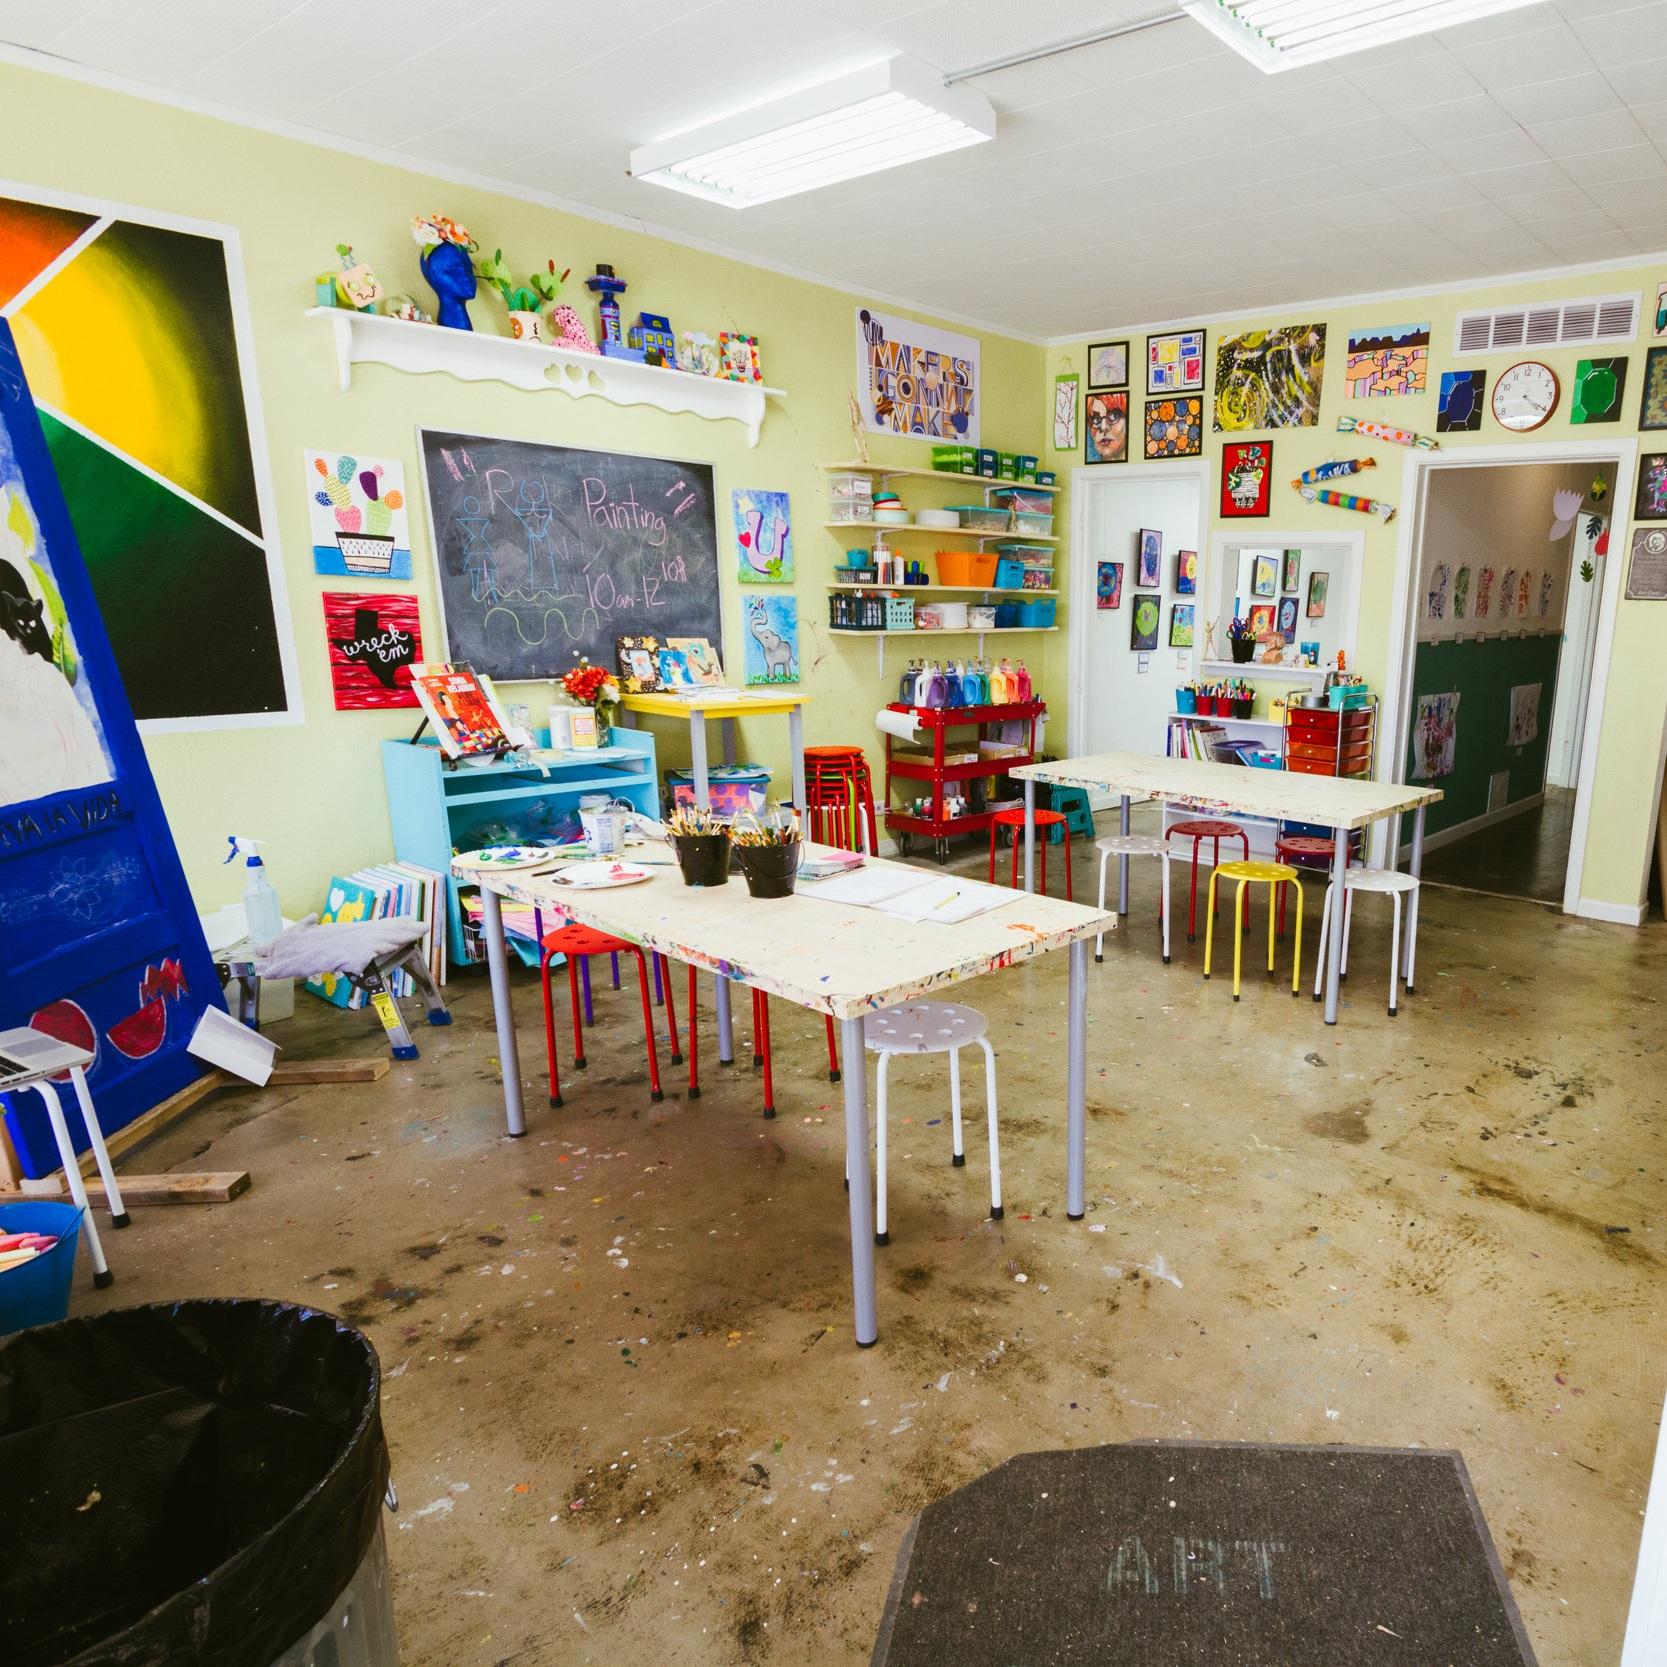 Miss Megan's Make Room - 10% off any Class, Workshop, or Camp Enrollment